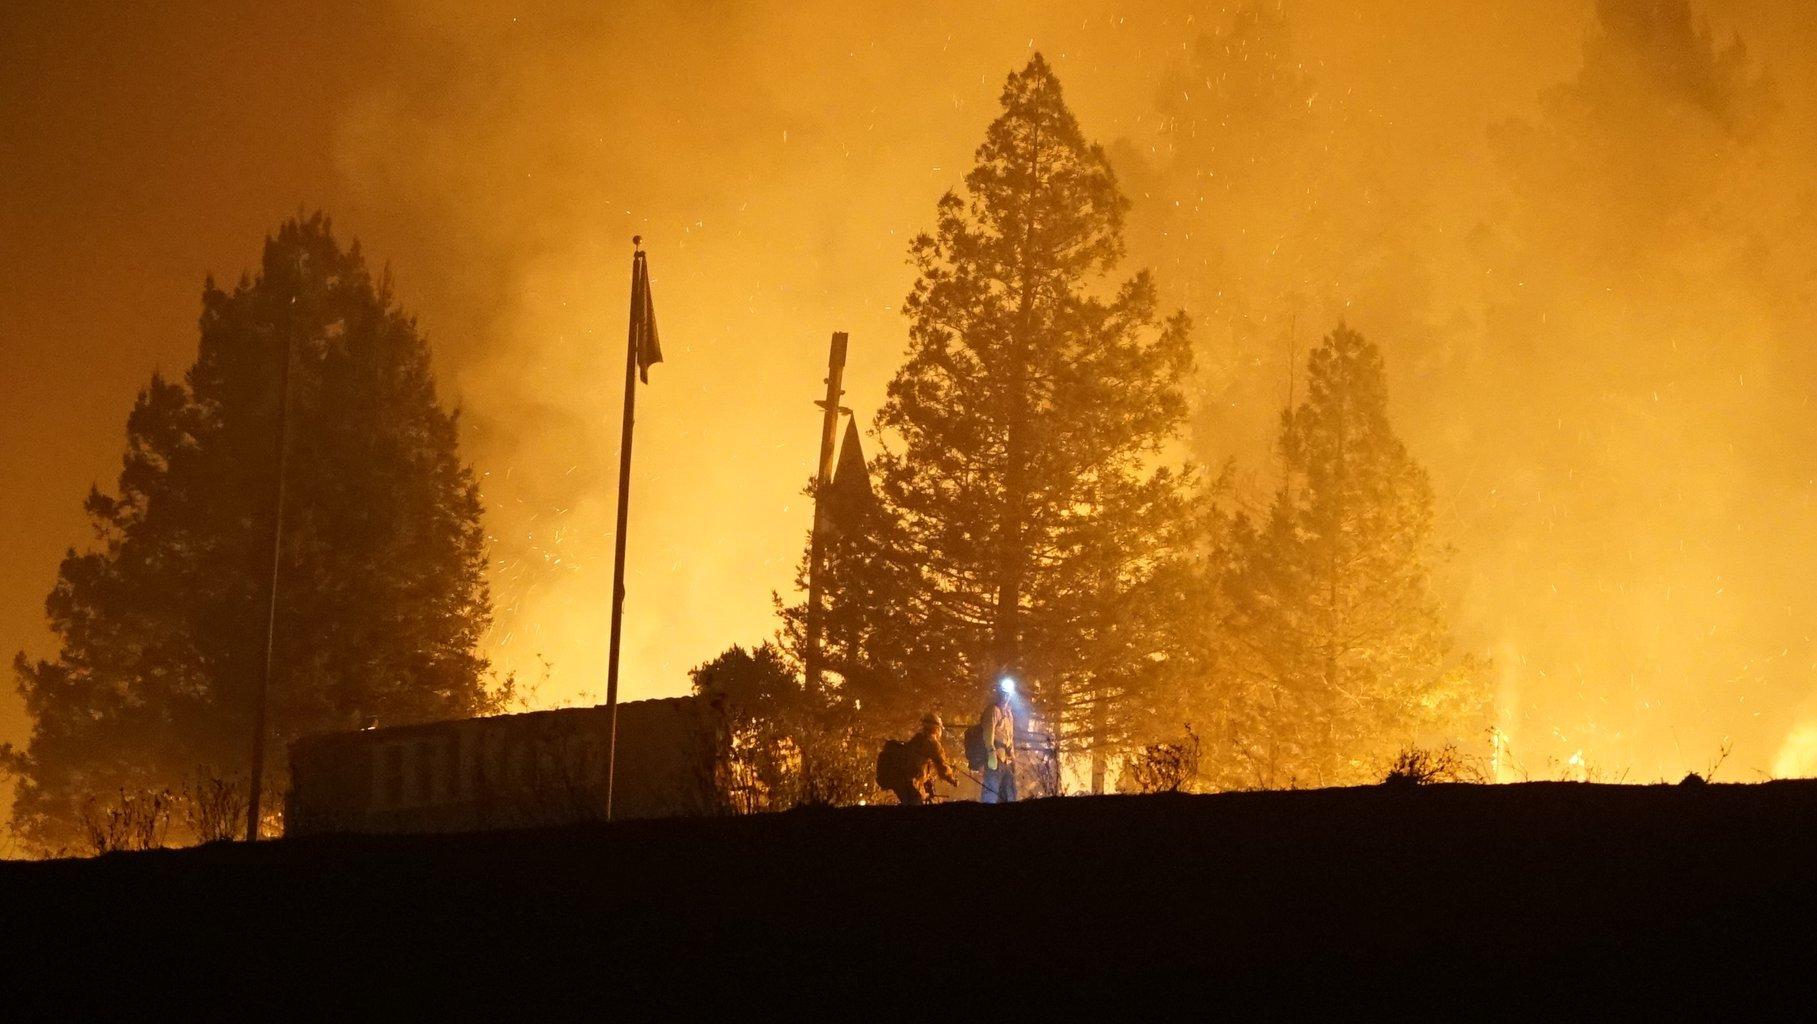 Climate change fire education